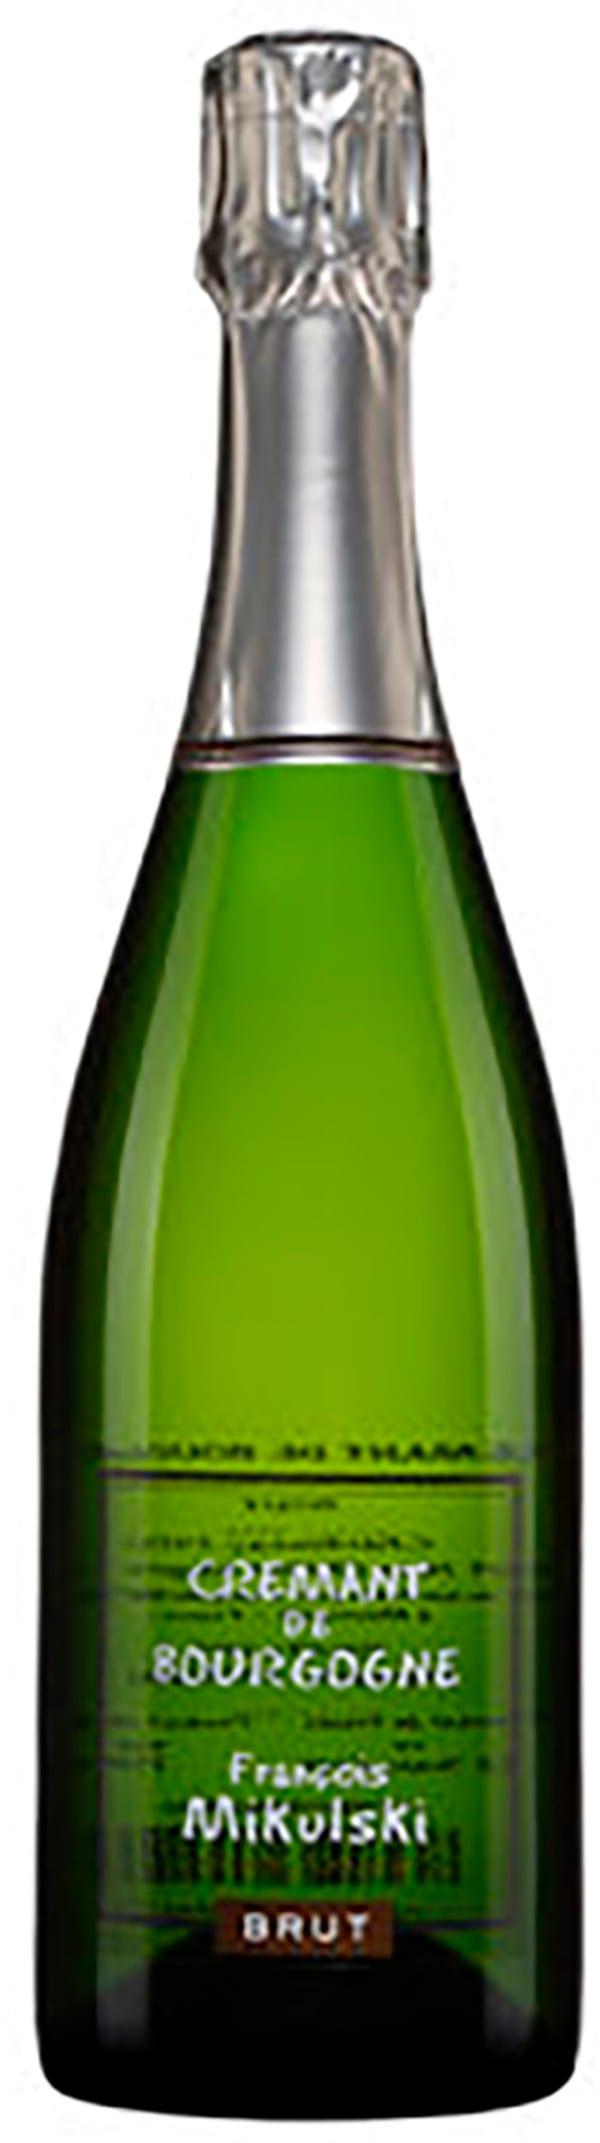 Francoise Mikulski Cremant de Bourgogne Brut